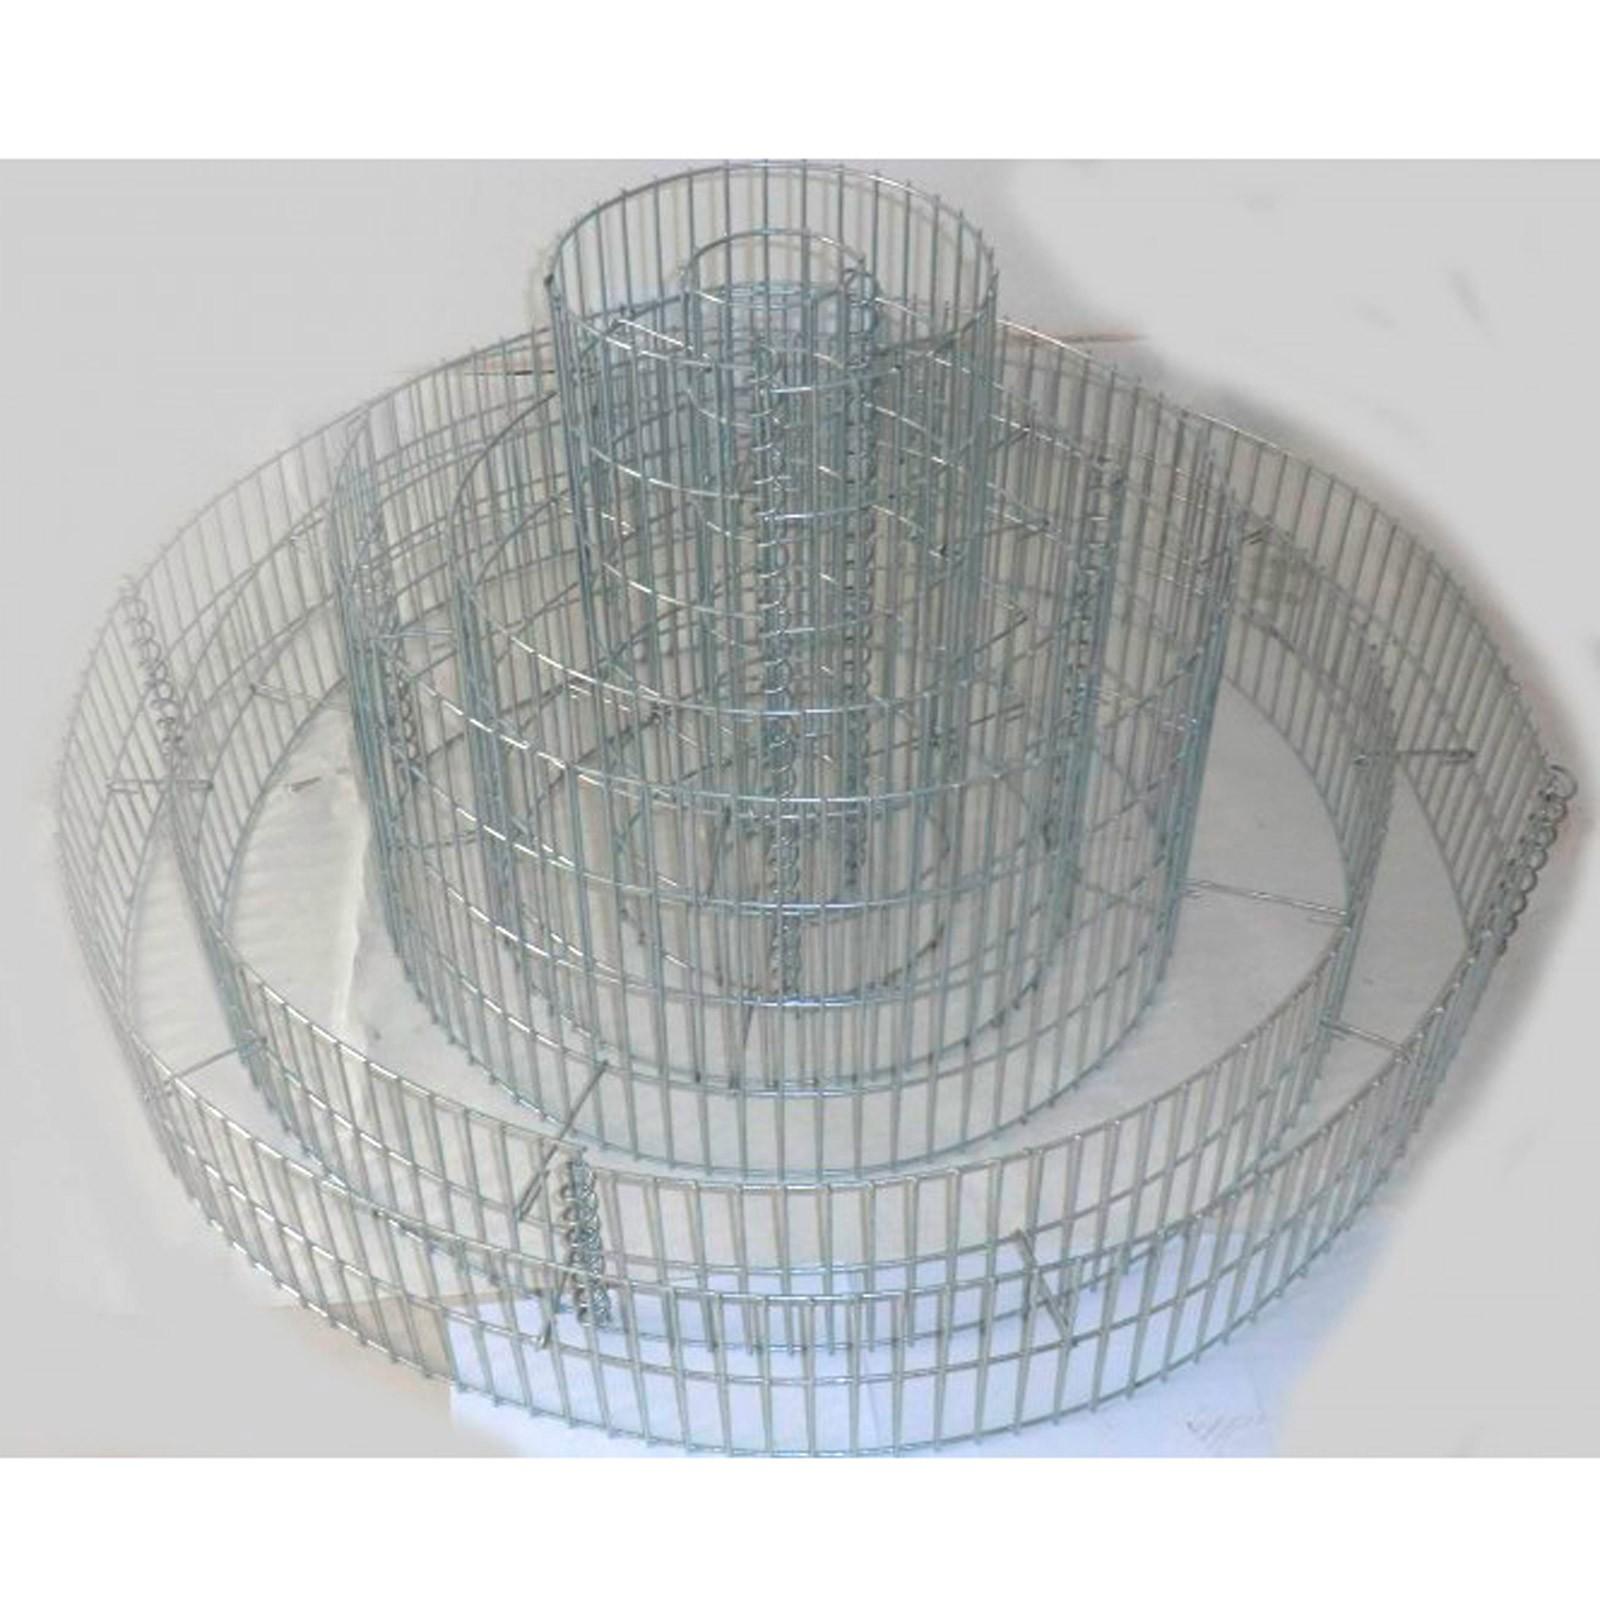 blumenpyramide gabione garten ring 20x140 40x80 60x40. Black Bedroom Furniture Sets. Home Design Ideas